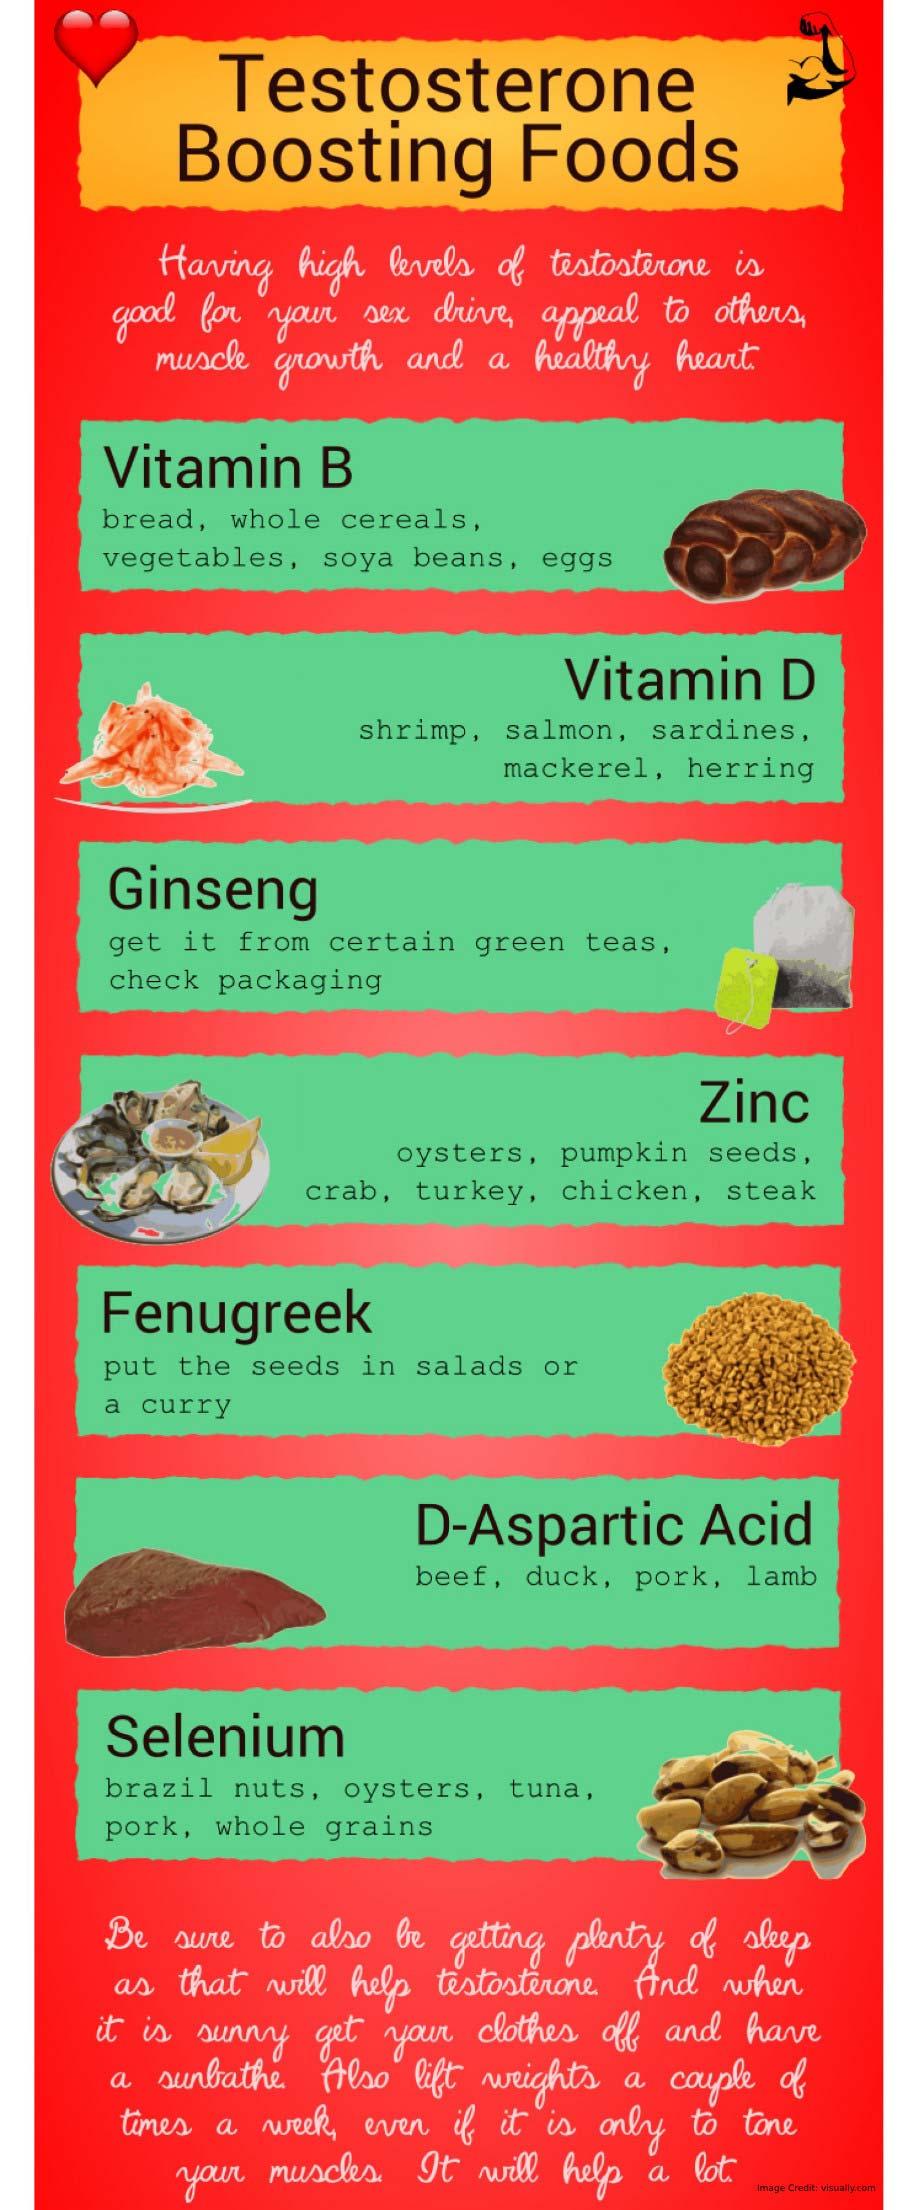 Testosterone Boosting Food Info